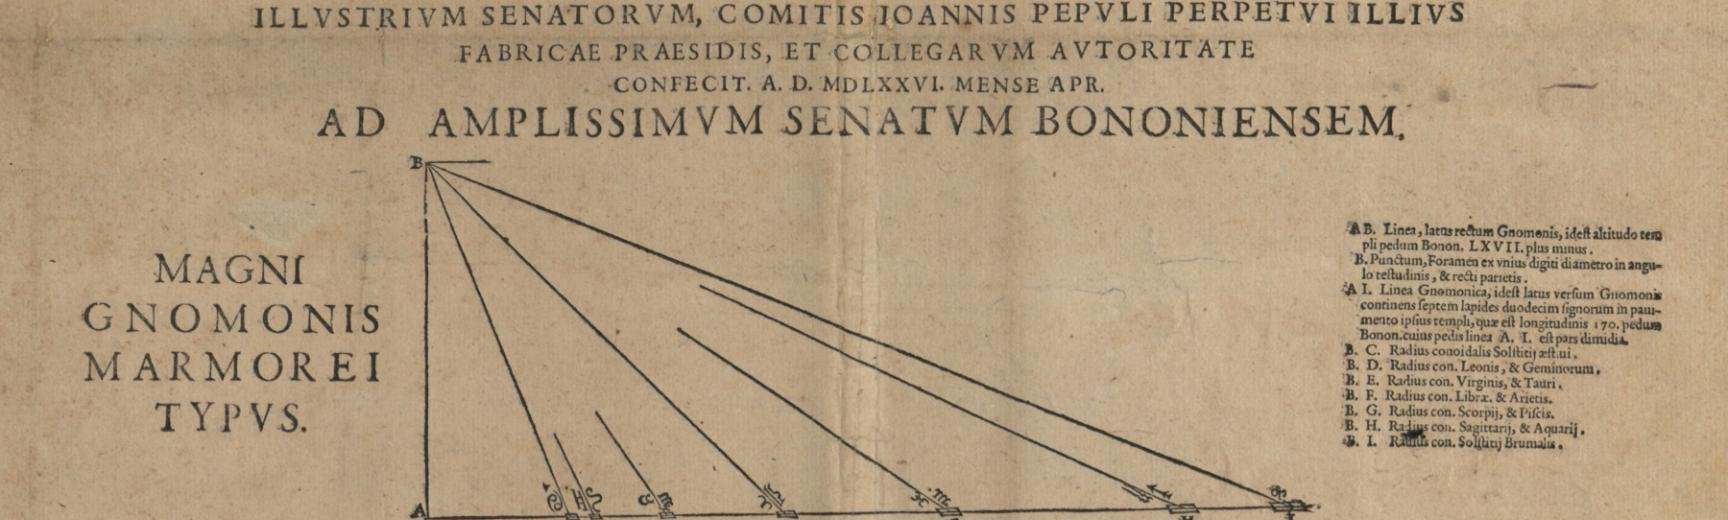 Mounted broadsheet 'Usus tractatio gnomonis magni' with diagram of a Sundial, Bologna, 1576